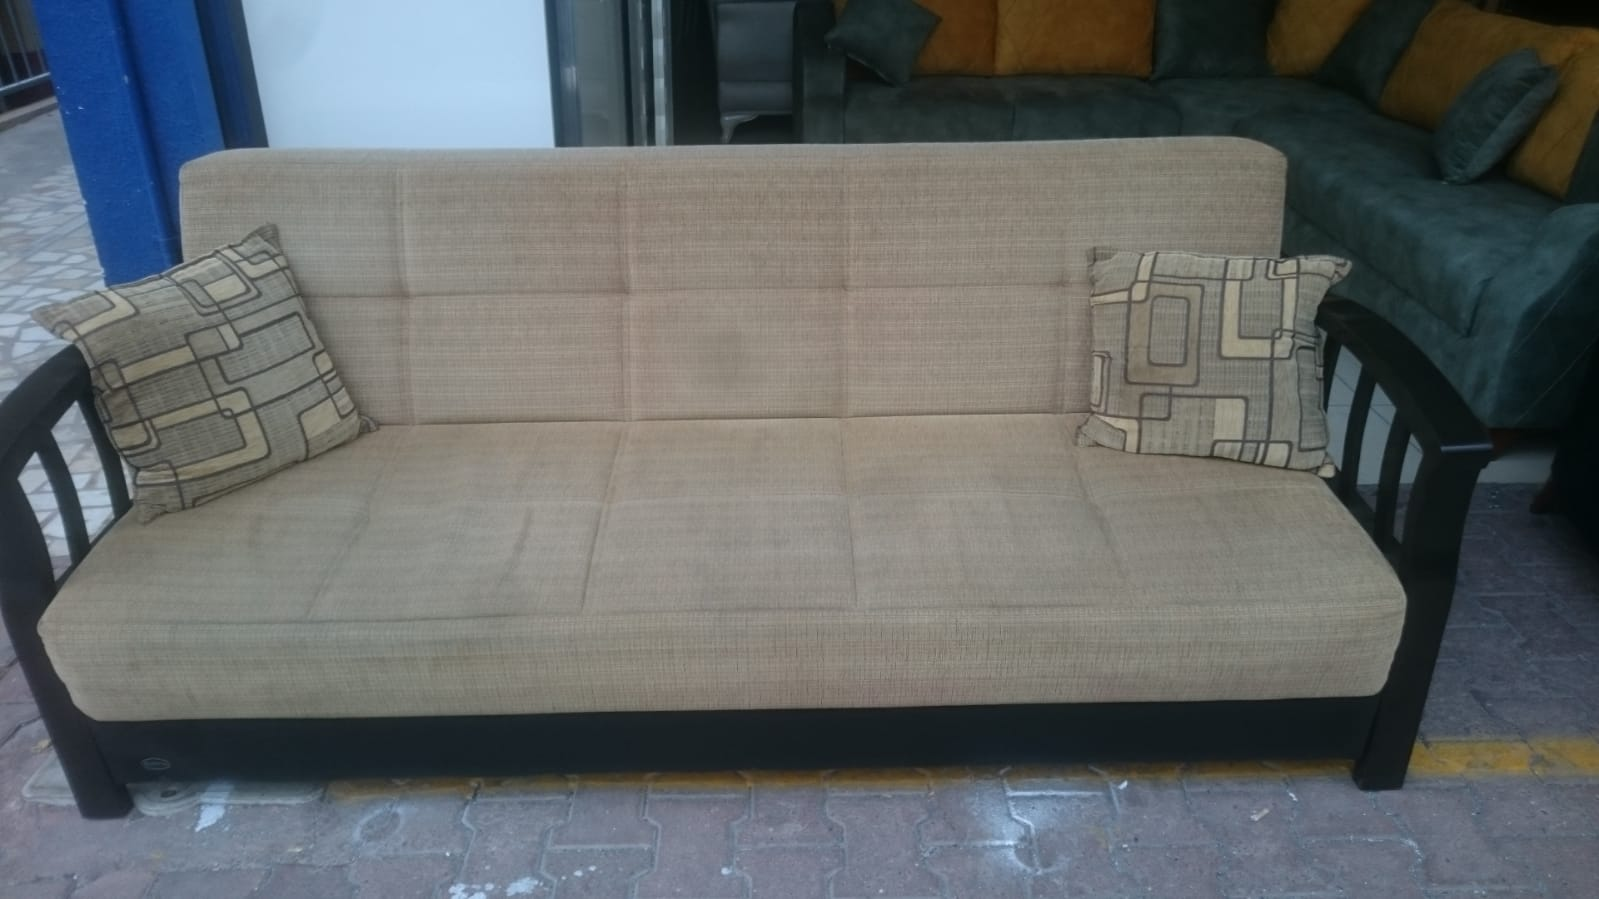 Antalya 2. ikinci el kanepe alımı